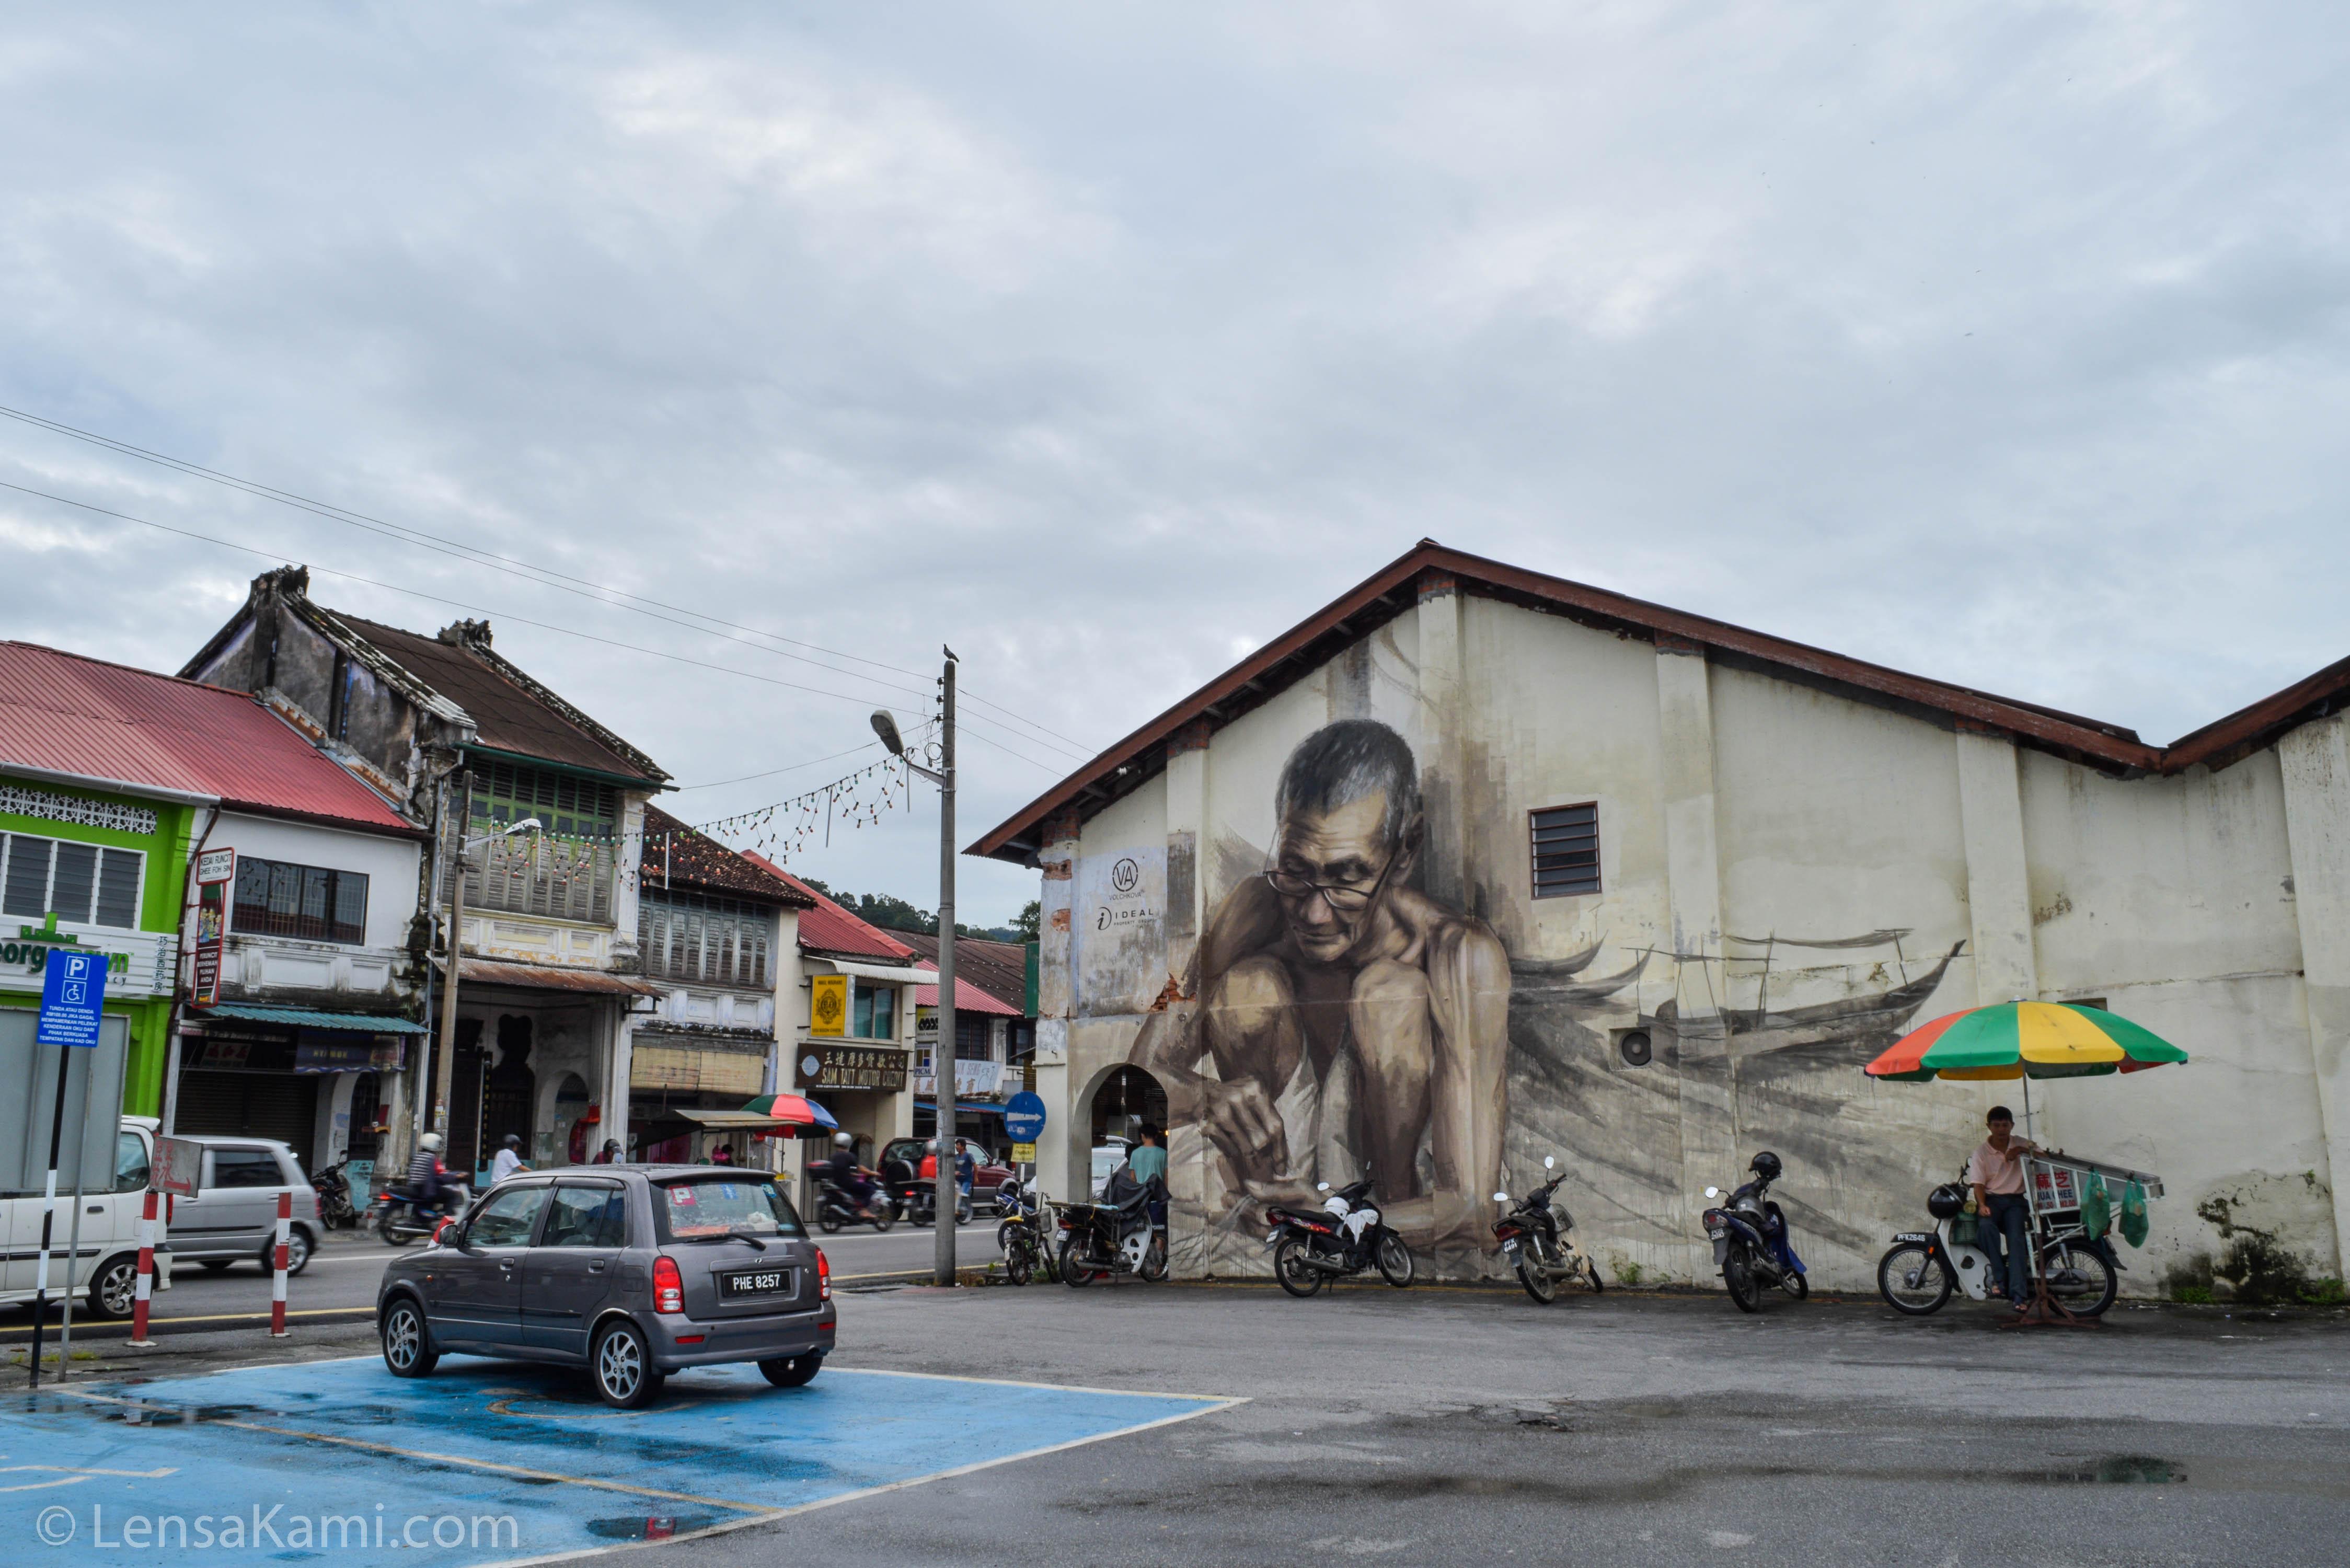 Terdapat beberapa mural di sekitar pekan Balik Pulau